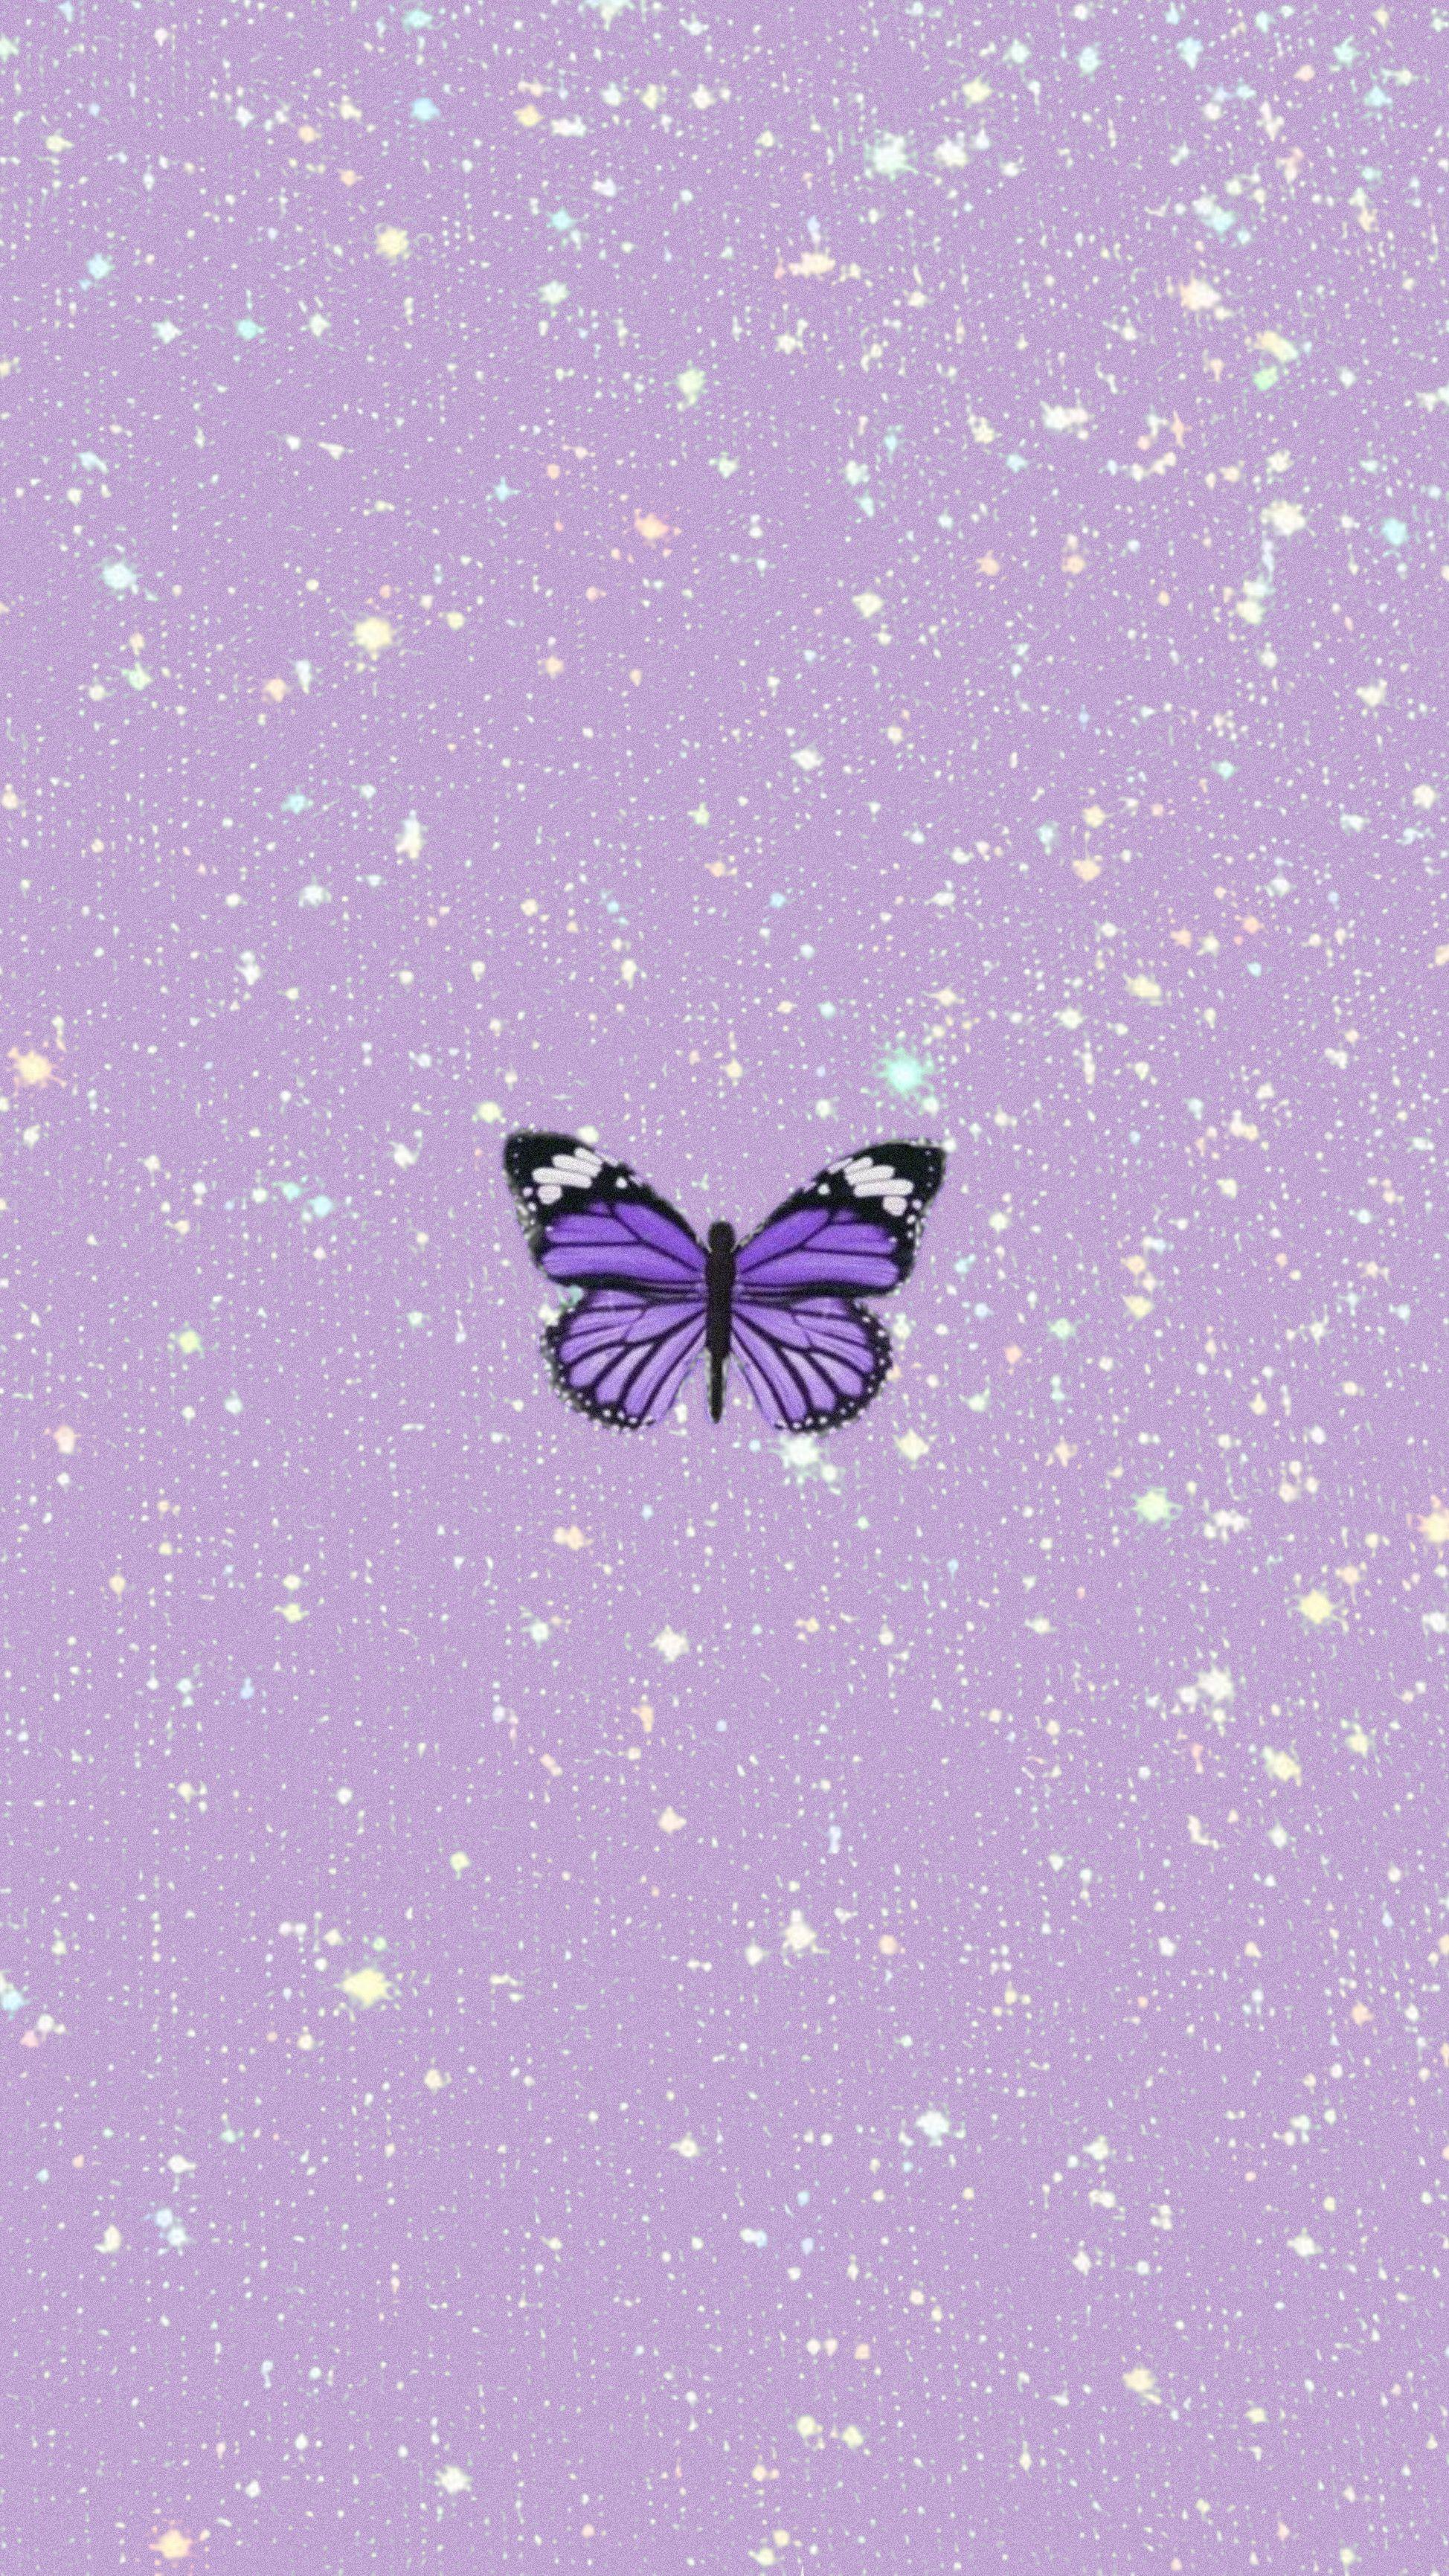 Aesthetic Pic Aesthetic Iphone Wallpaper Butterfly Wallpaper Iphone Purple Wallpaper Iphone